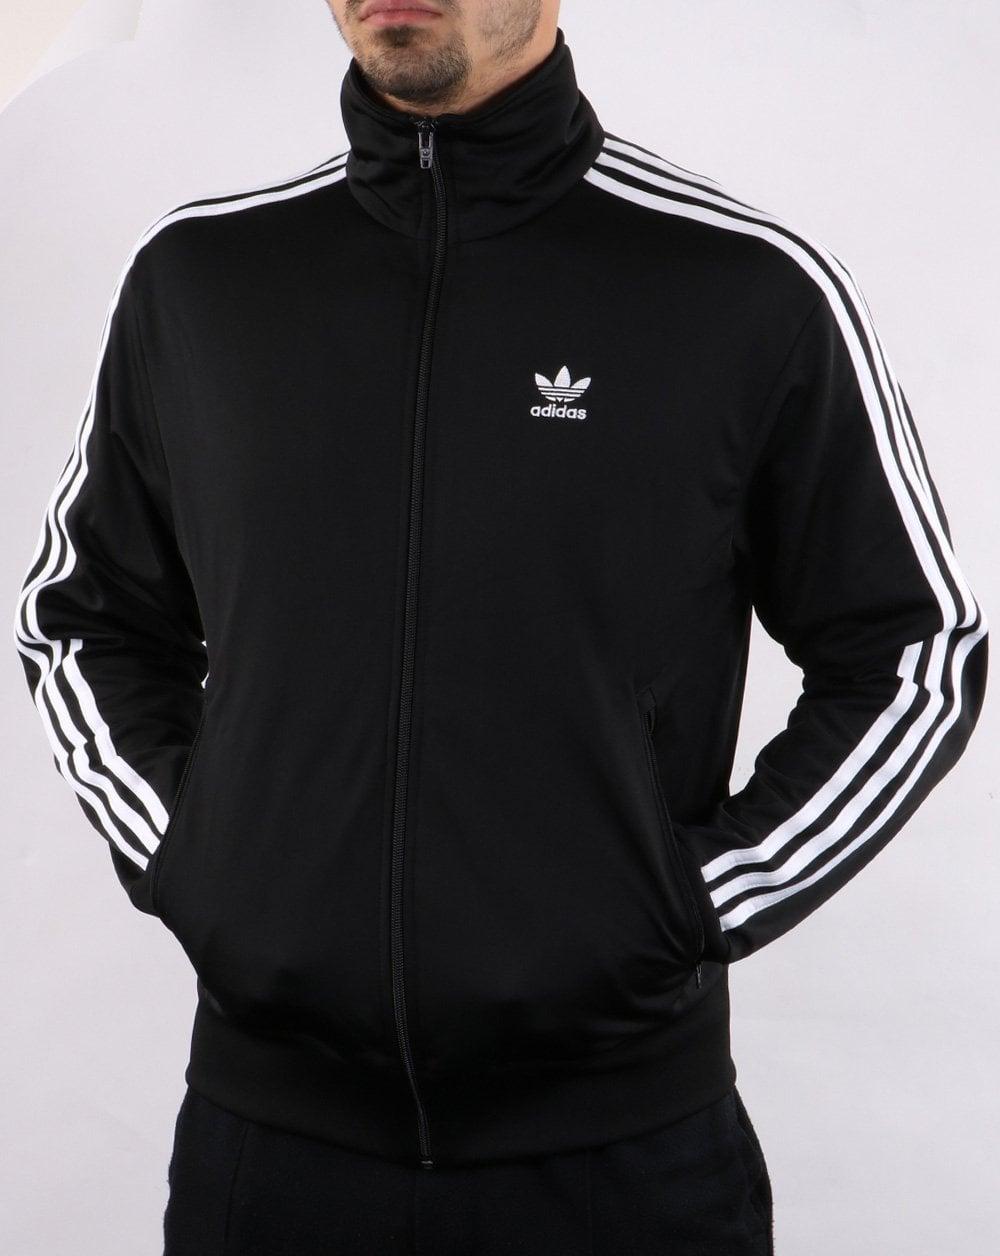 Adidas Originals Firebird Track Top Black